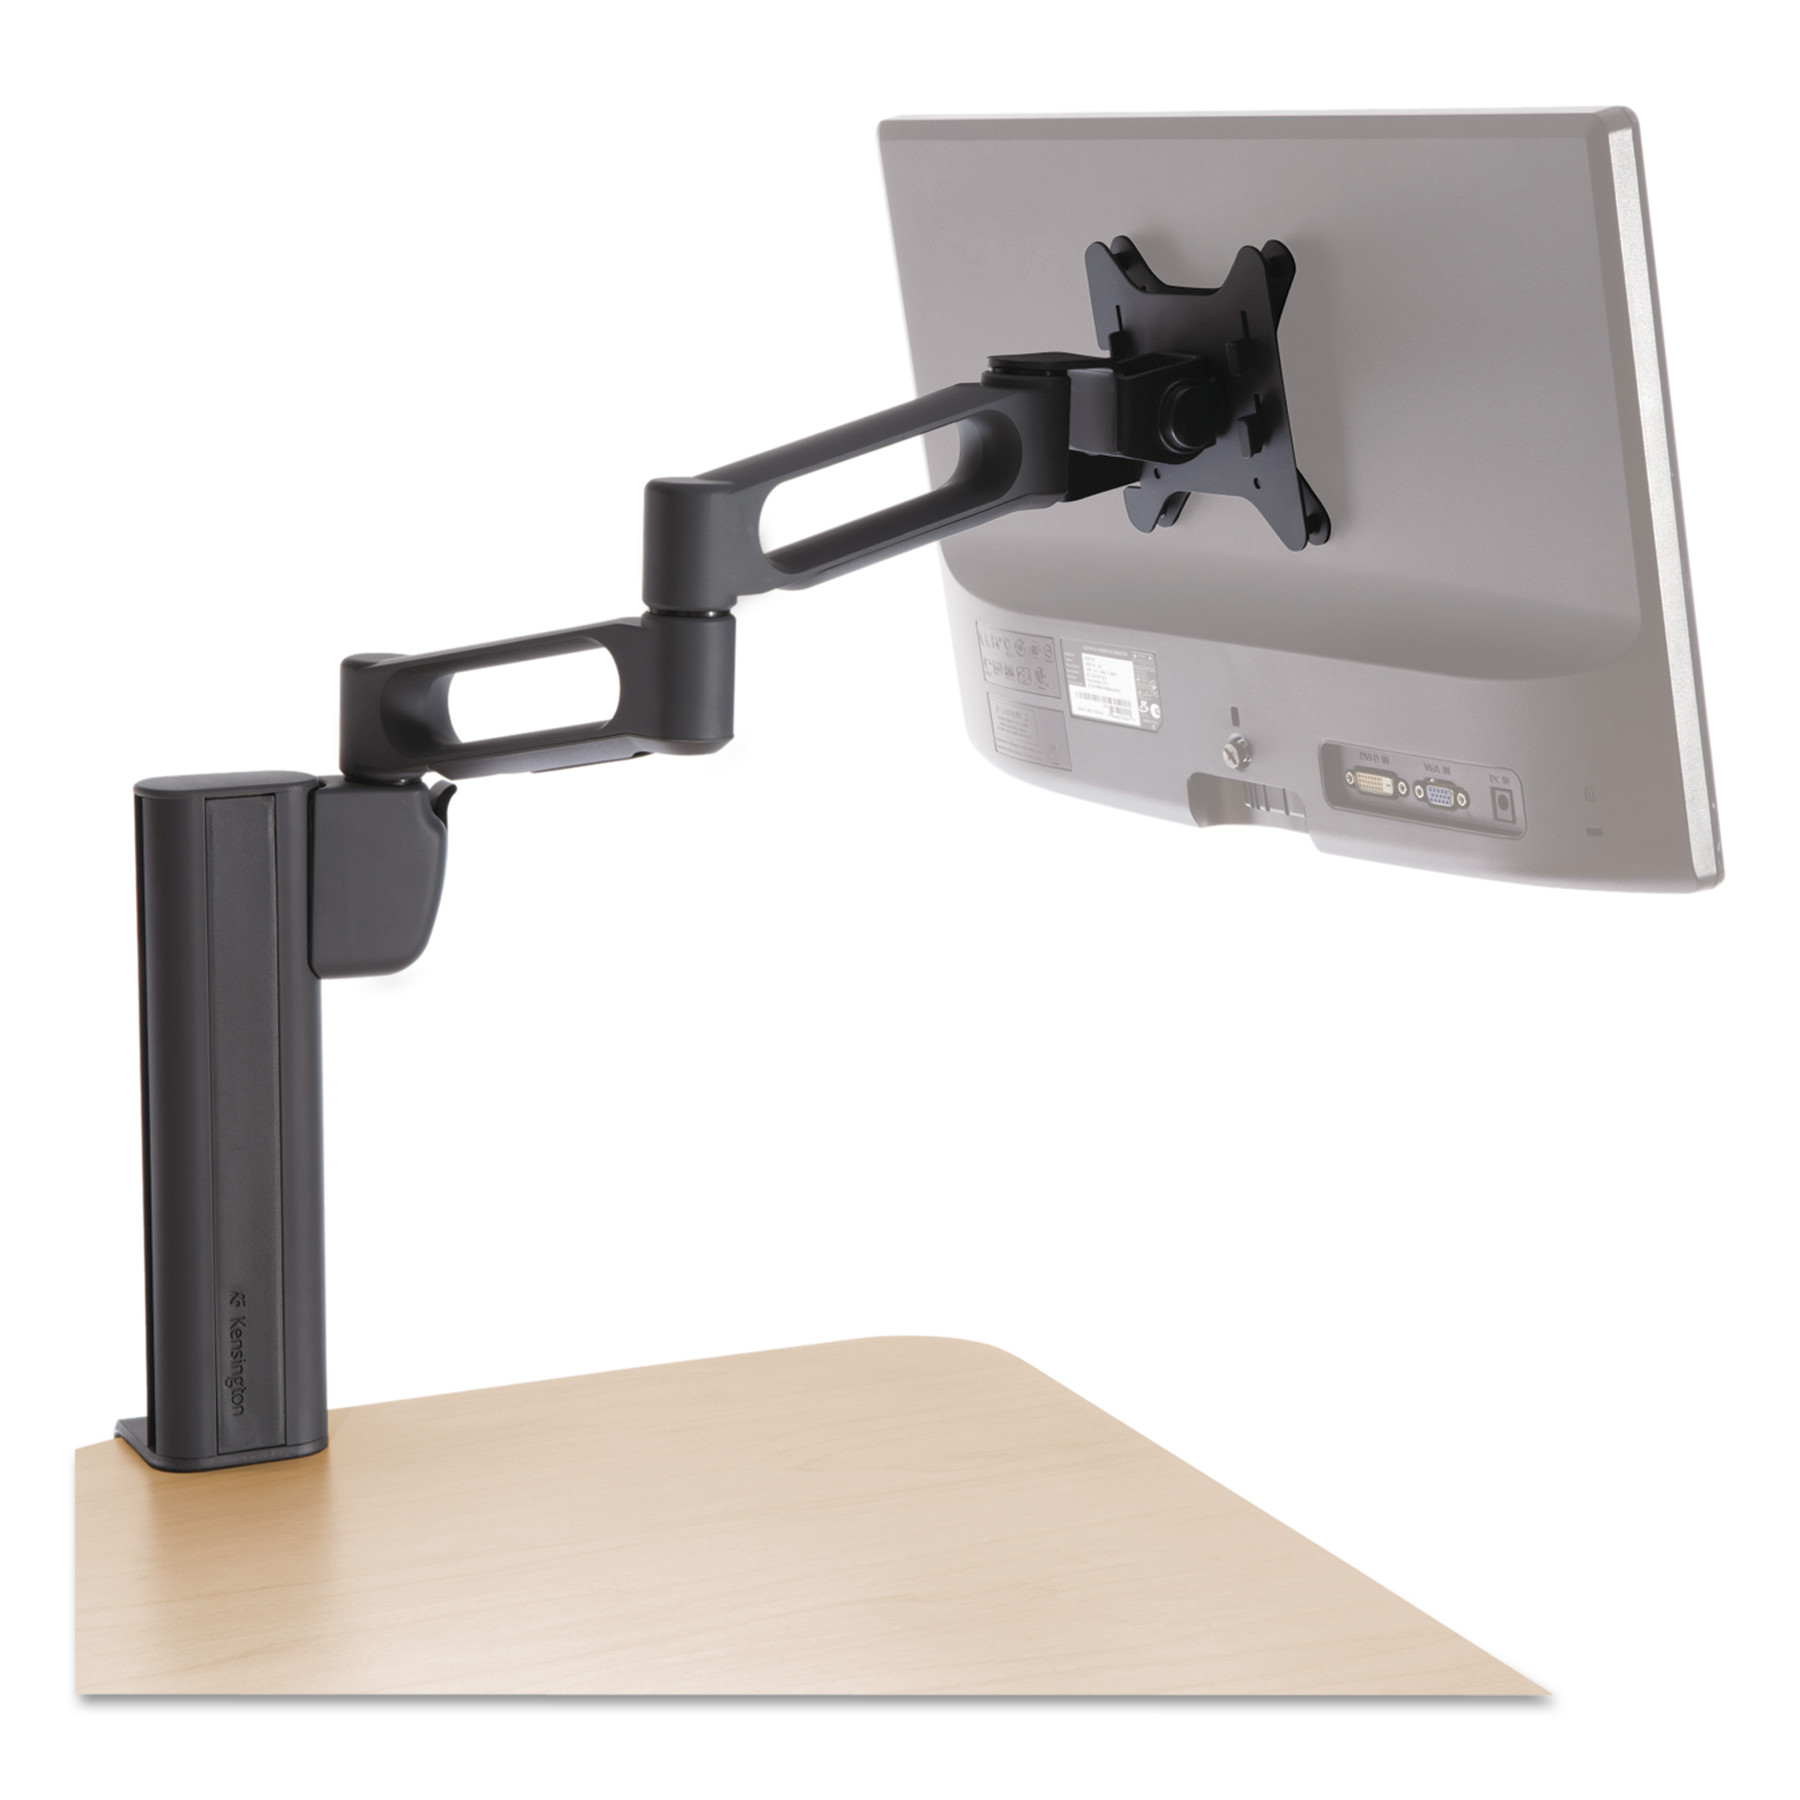 Kensington Column Mount Extended Monitor Arm w SmartFit System by Kensington